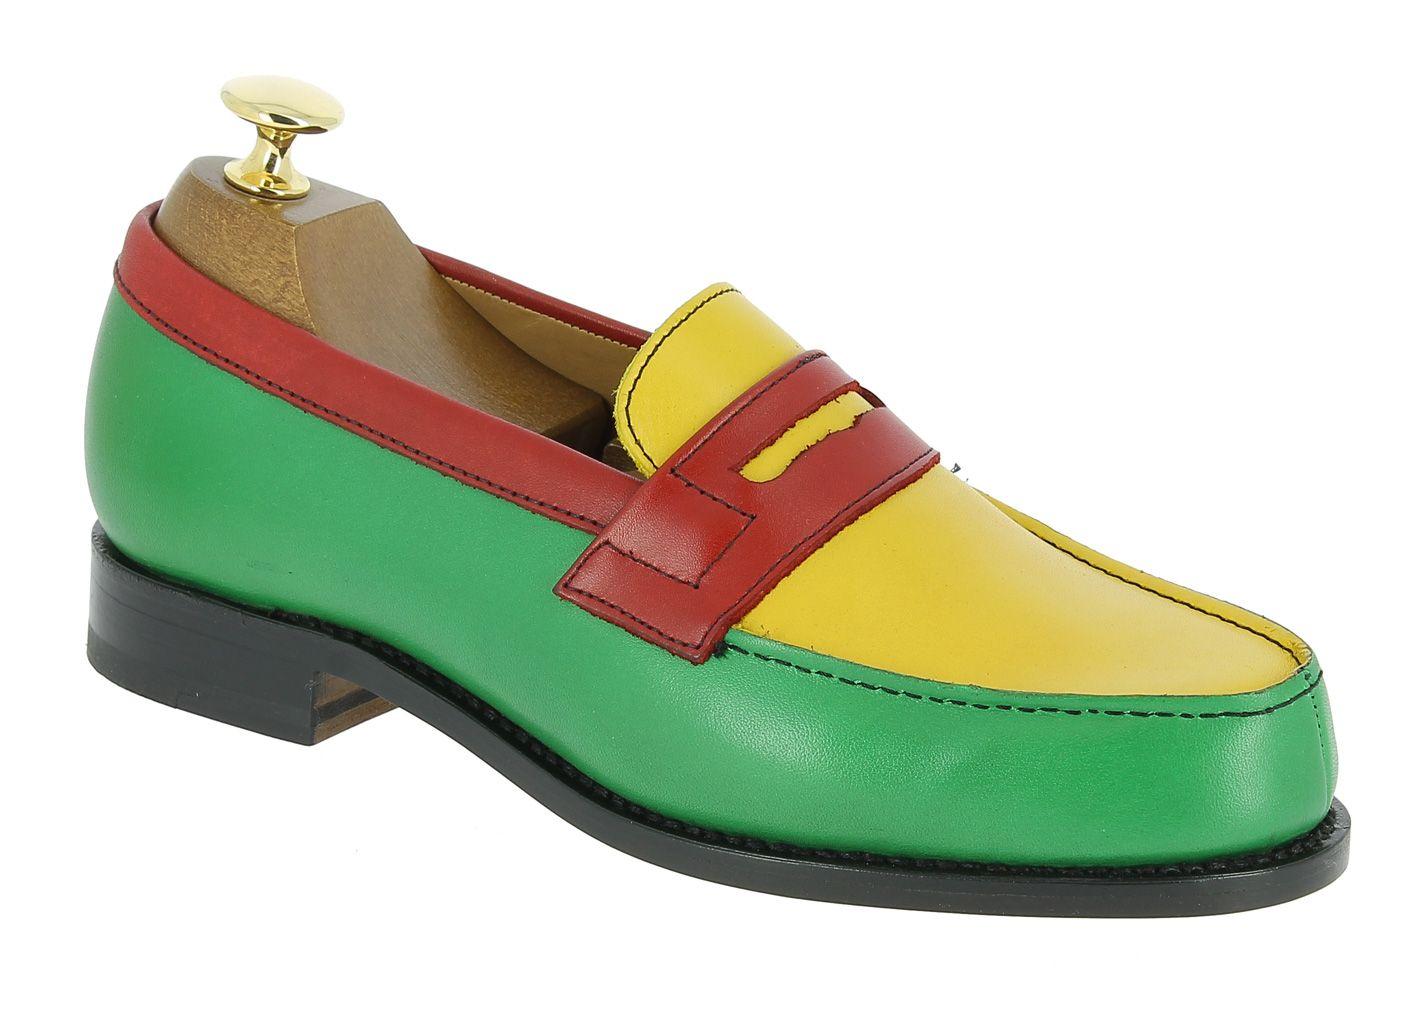 1f7f8e830b8211 Mocassin Femme, Chaussures Hommes, Collection De Chaussures, Mode, Mocassins  En Cuir,